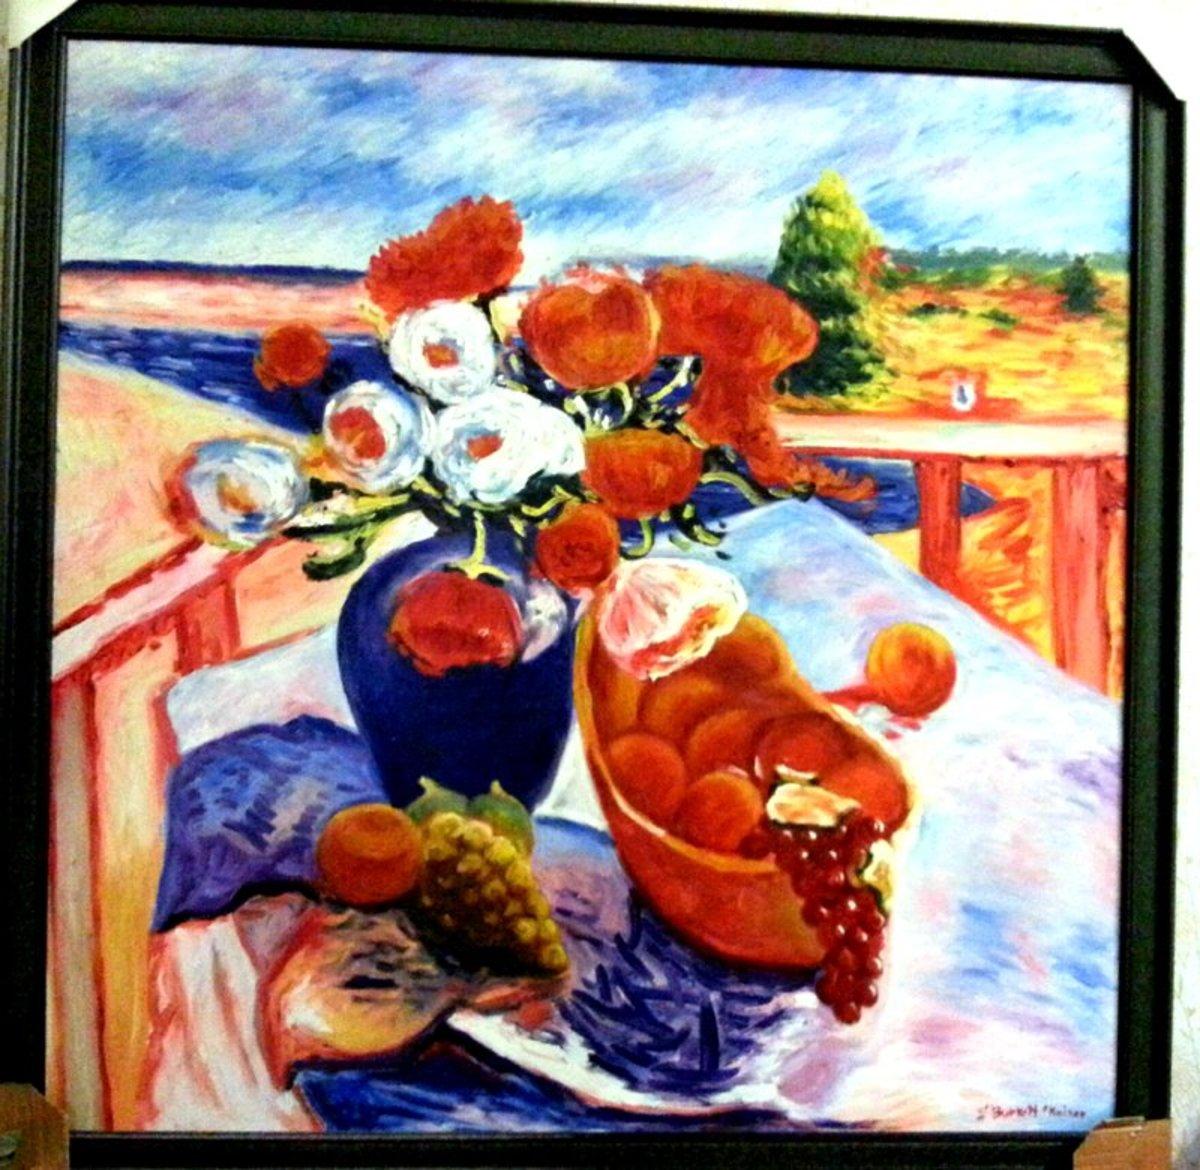 Reproduction painting that I bought in Phuket. Original artwork by S. Burkett Kaiser